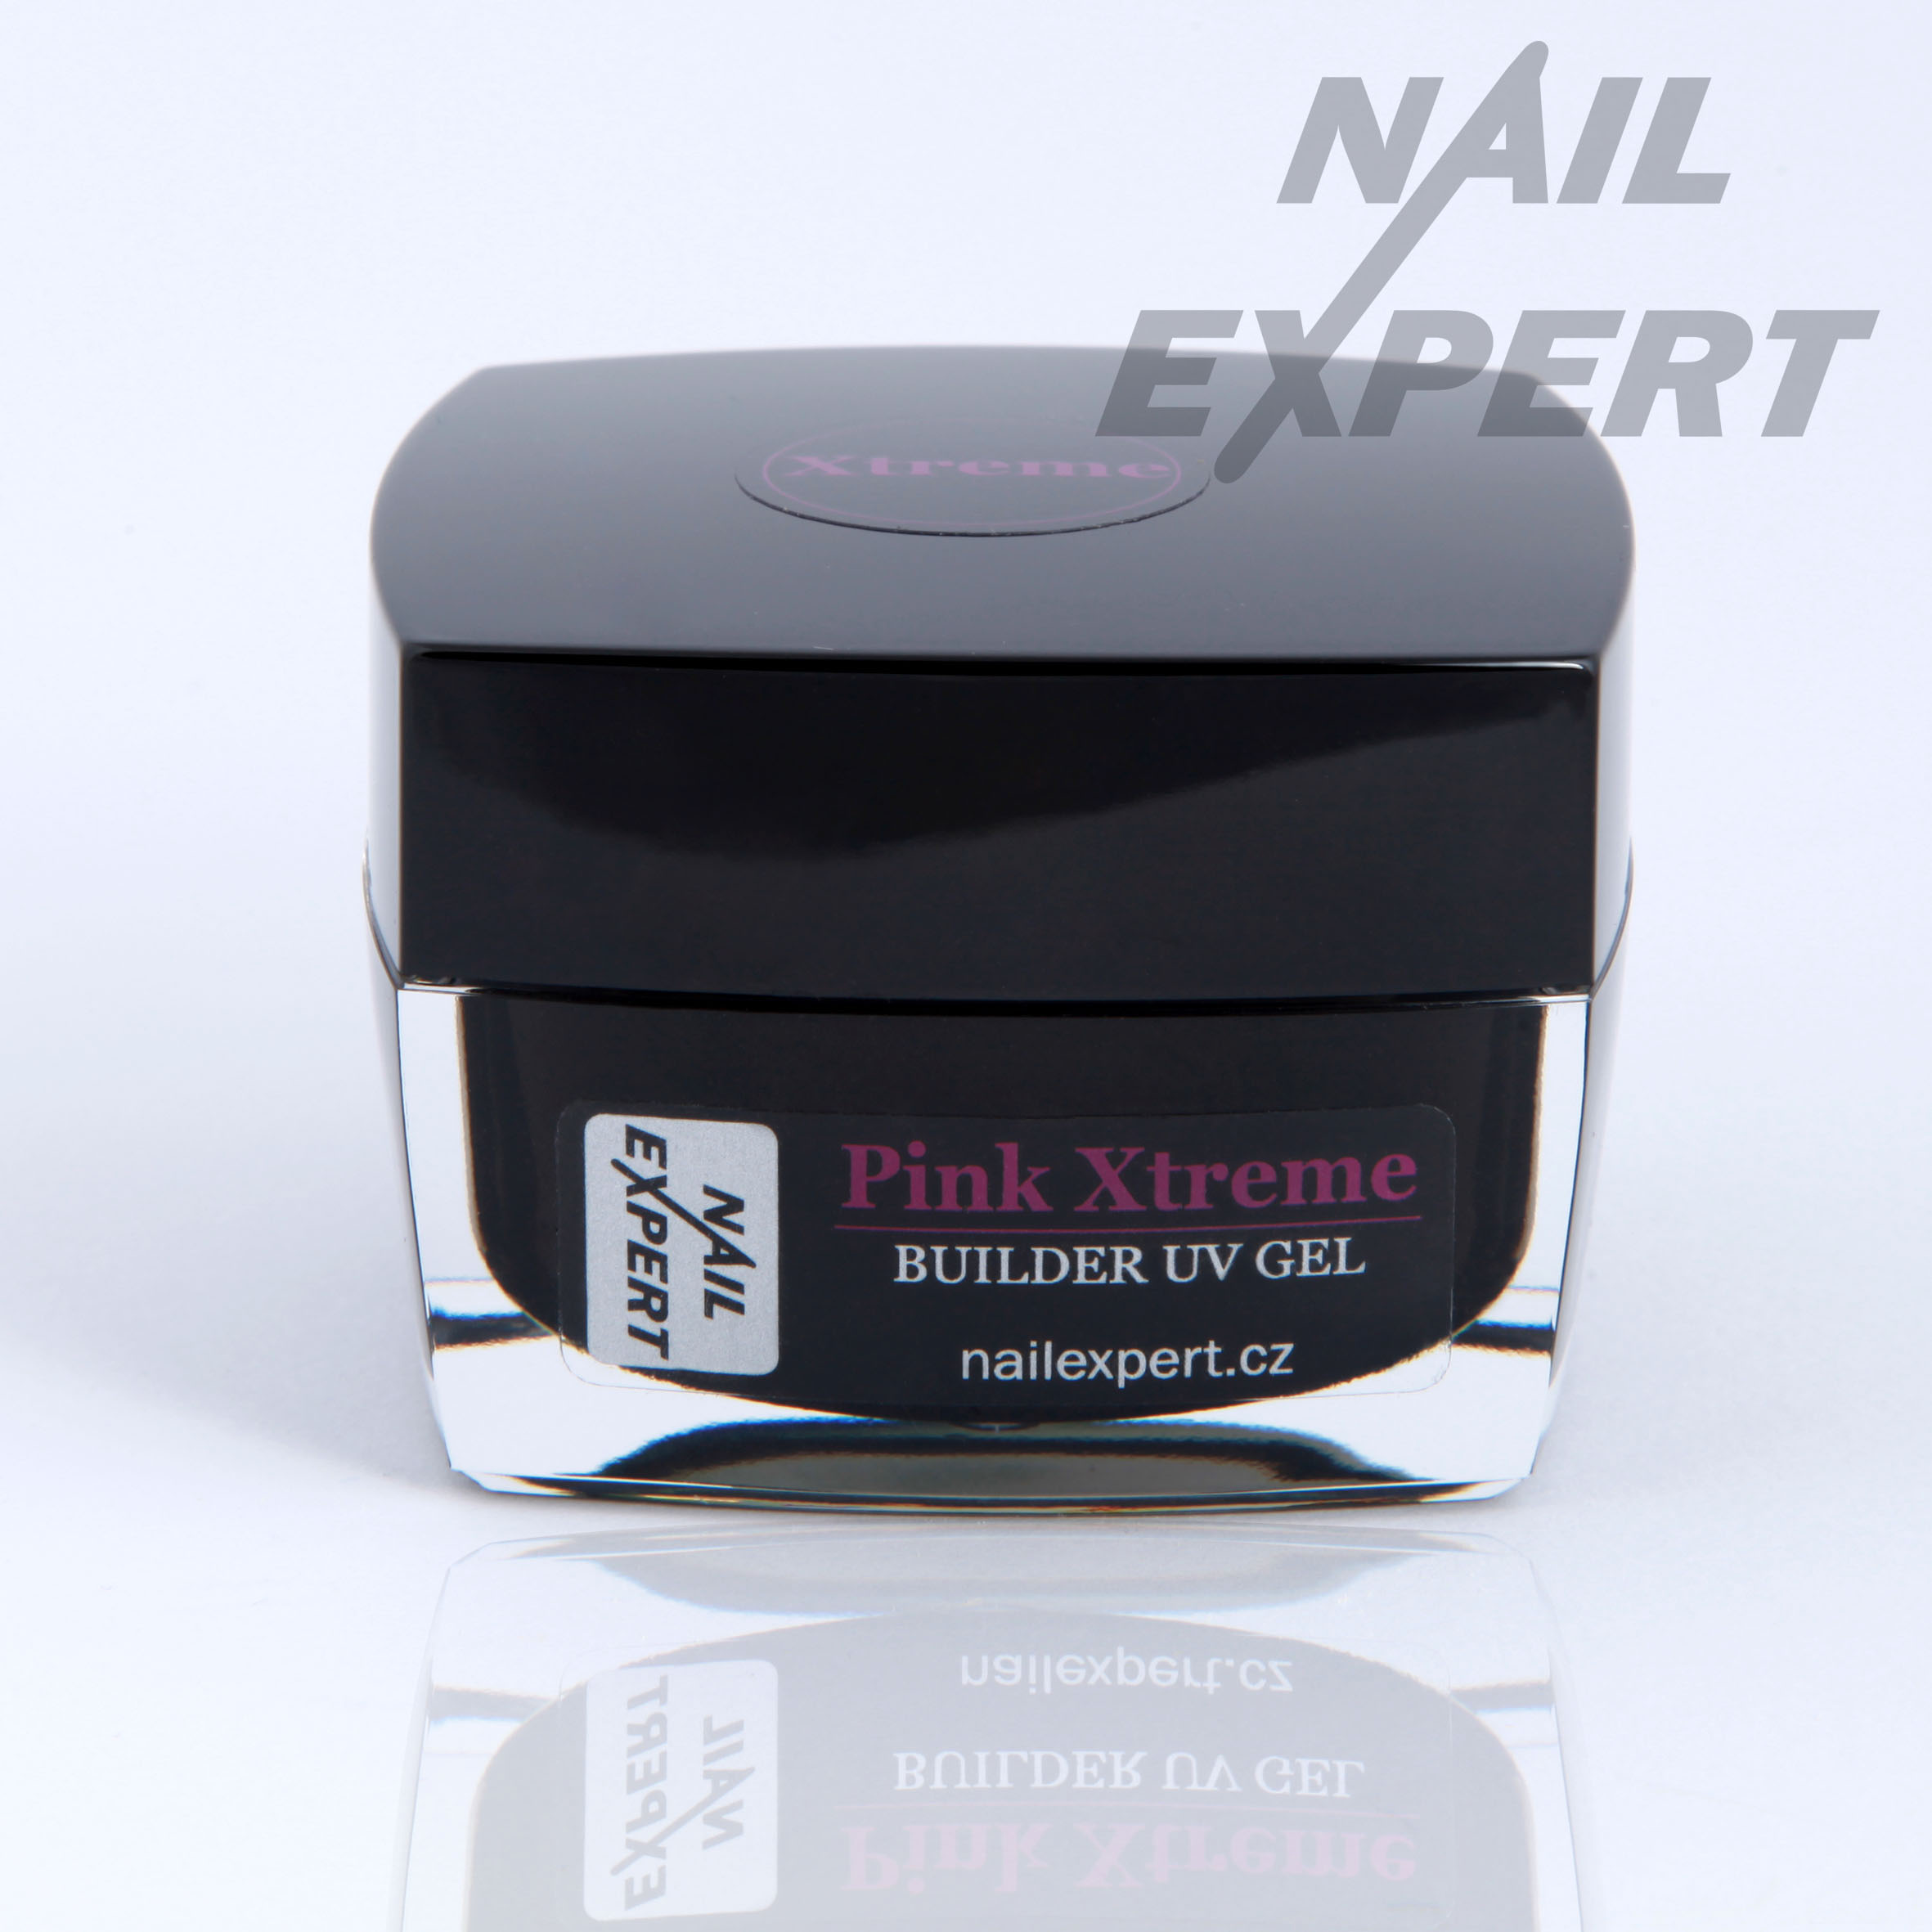 Nail Expert Vzorek UV gelu PINK XTREME 5 ml